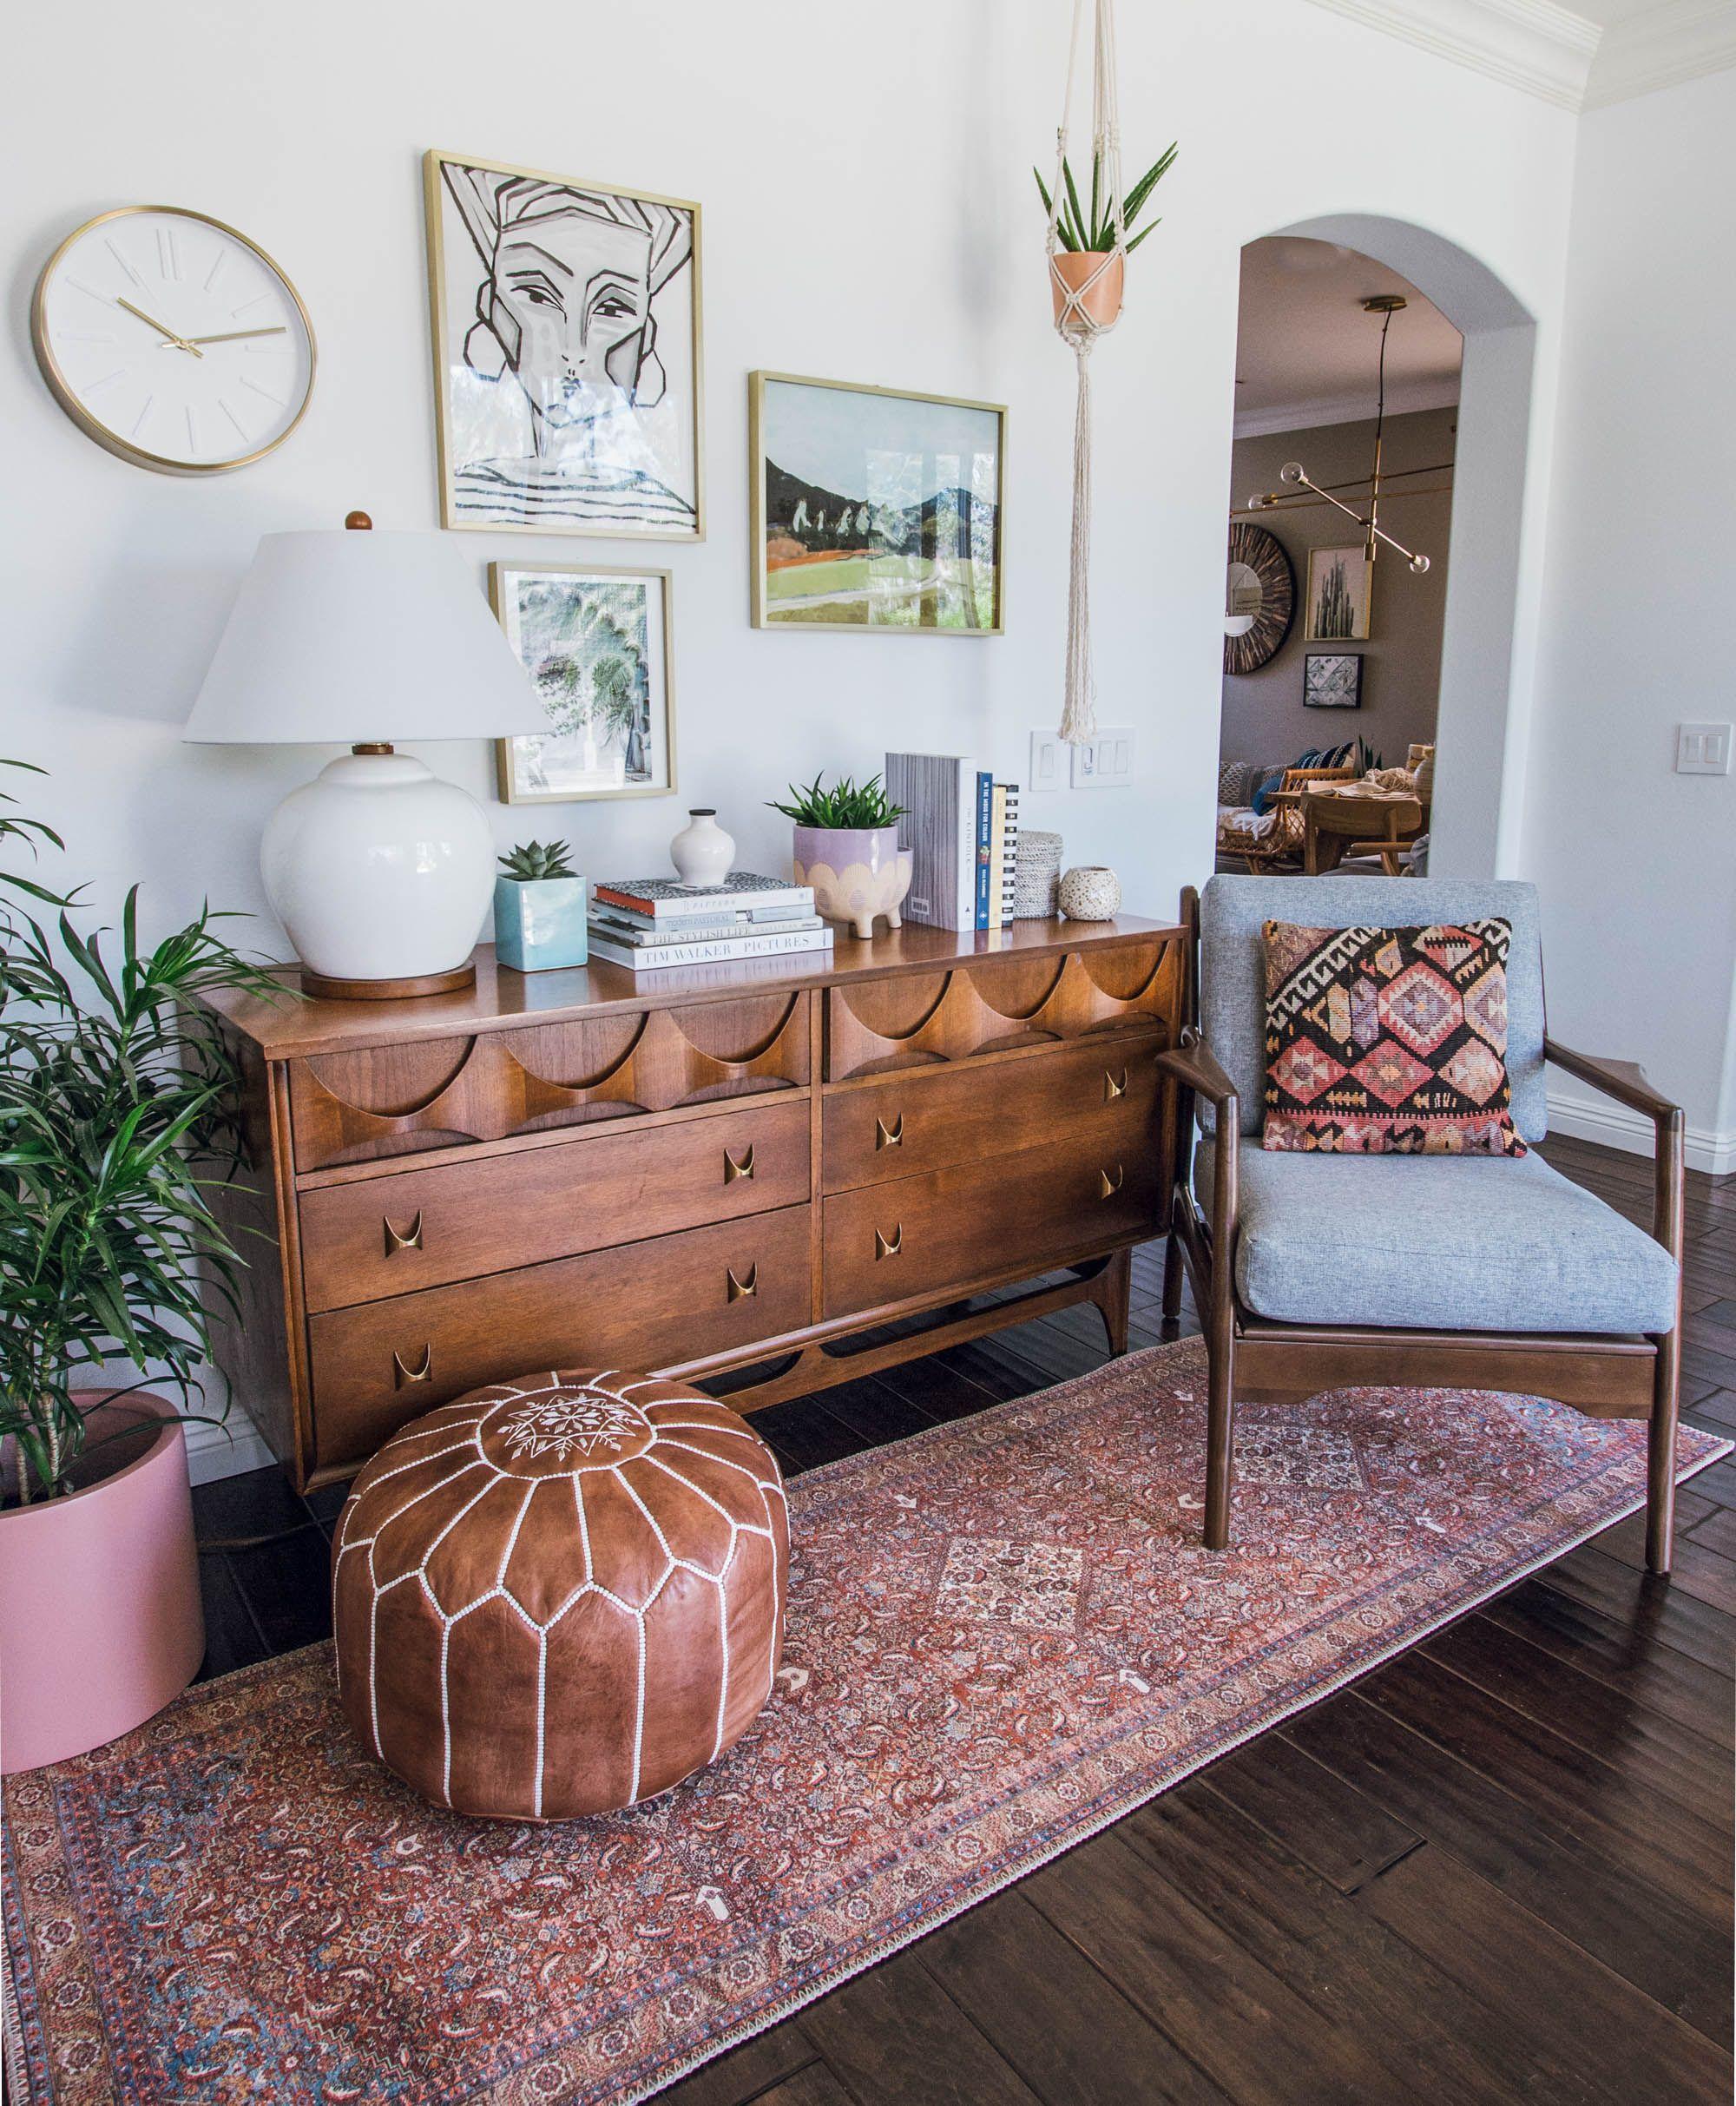 Broyhill brasilia mid century modern furniture loloi runner modern